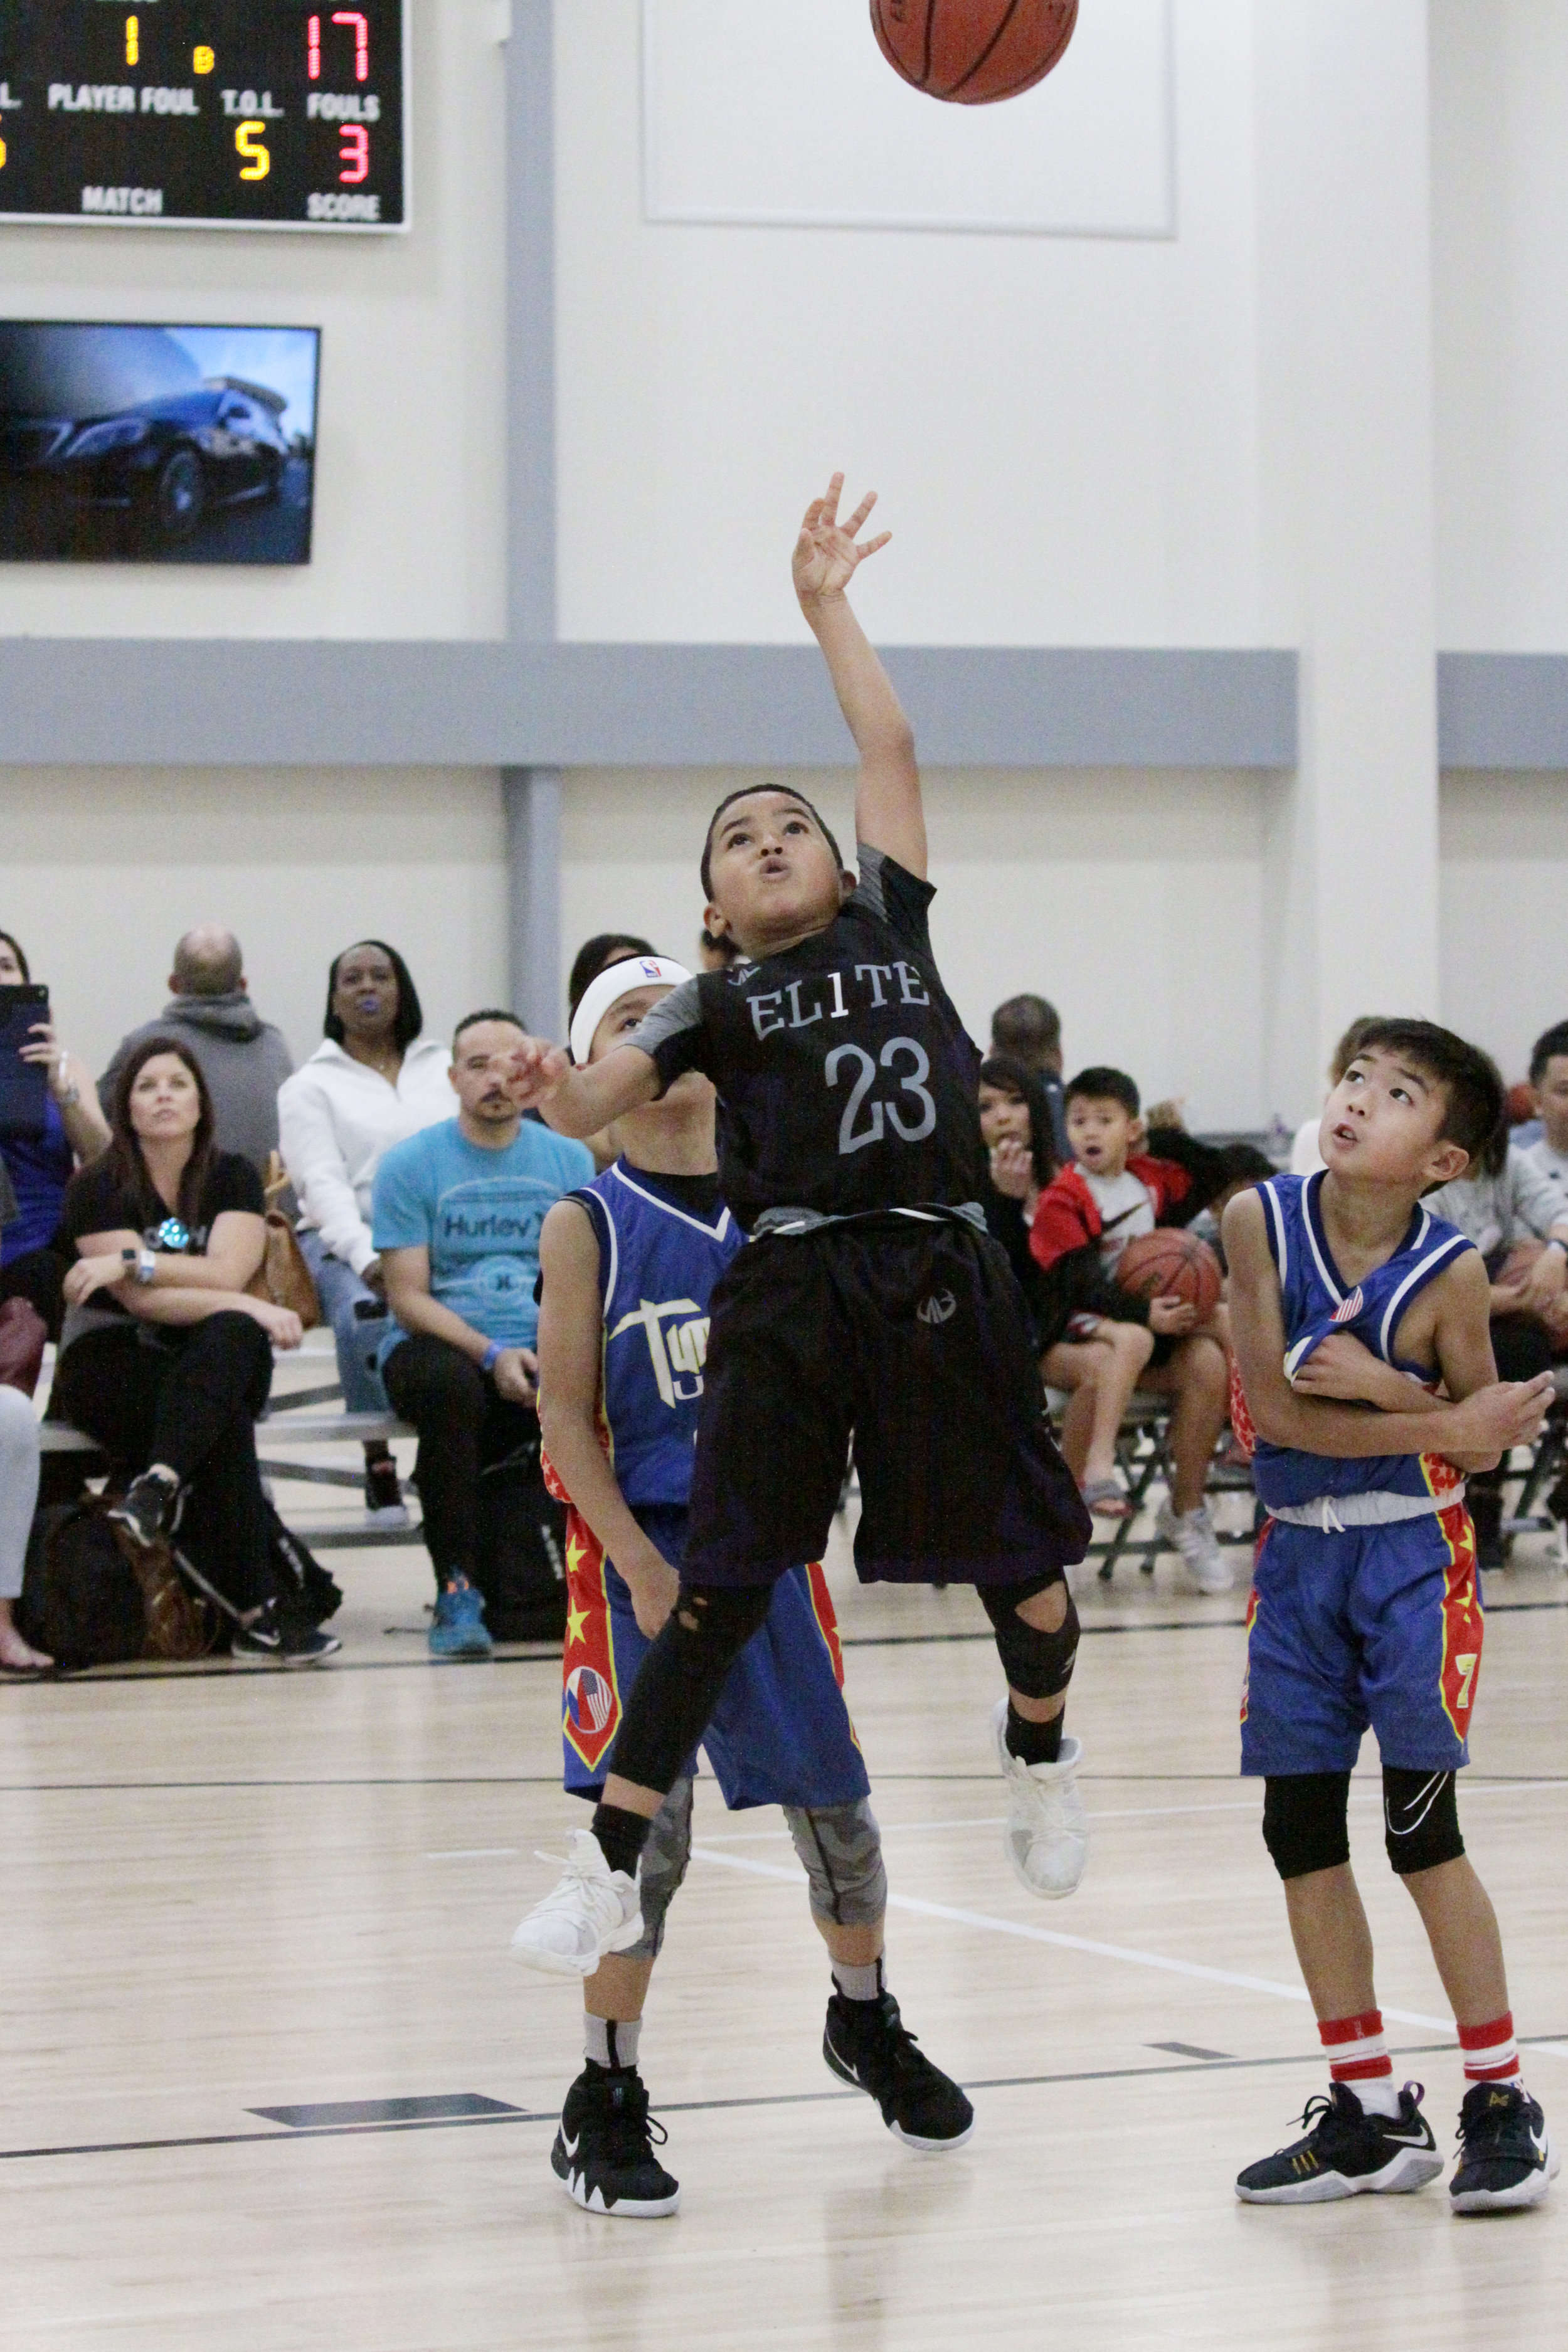 kid shooting a basket